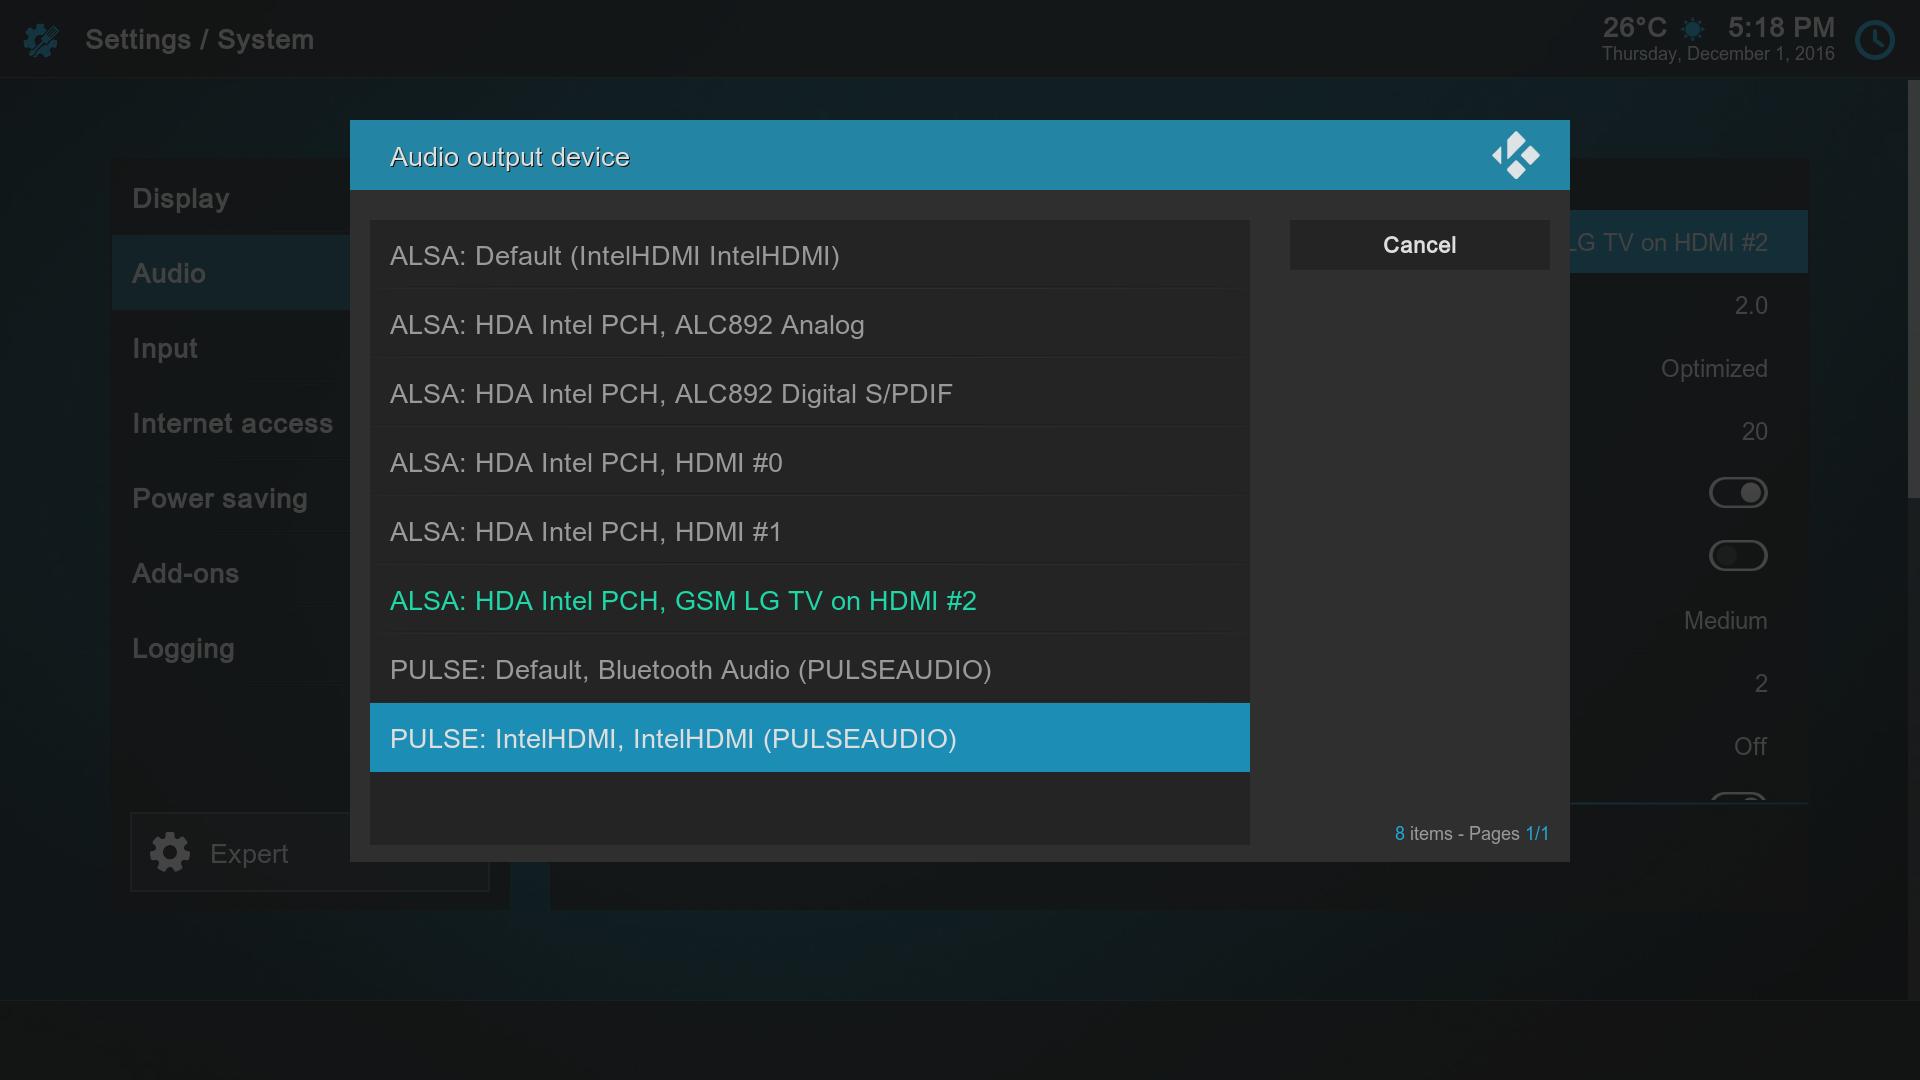 RetroELEC (Generic/RPi/XU4) Emulationstation/RetroArch/Kodi